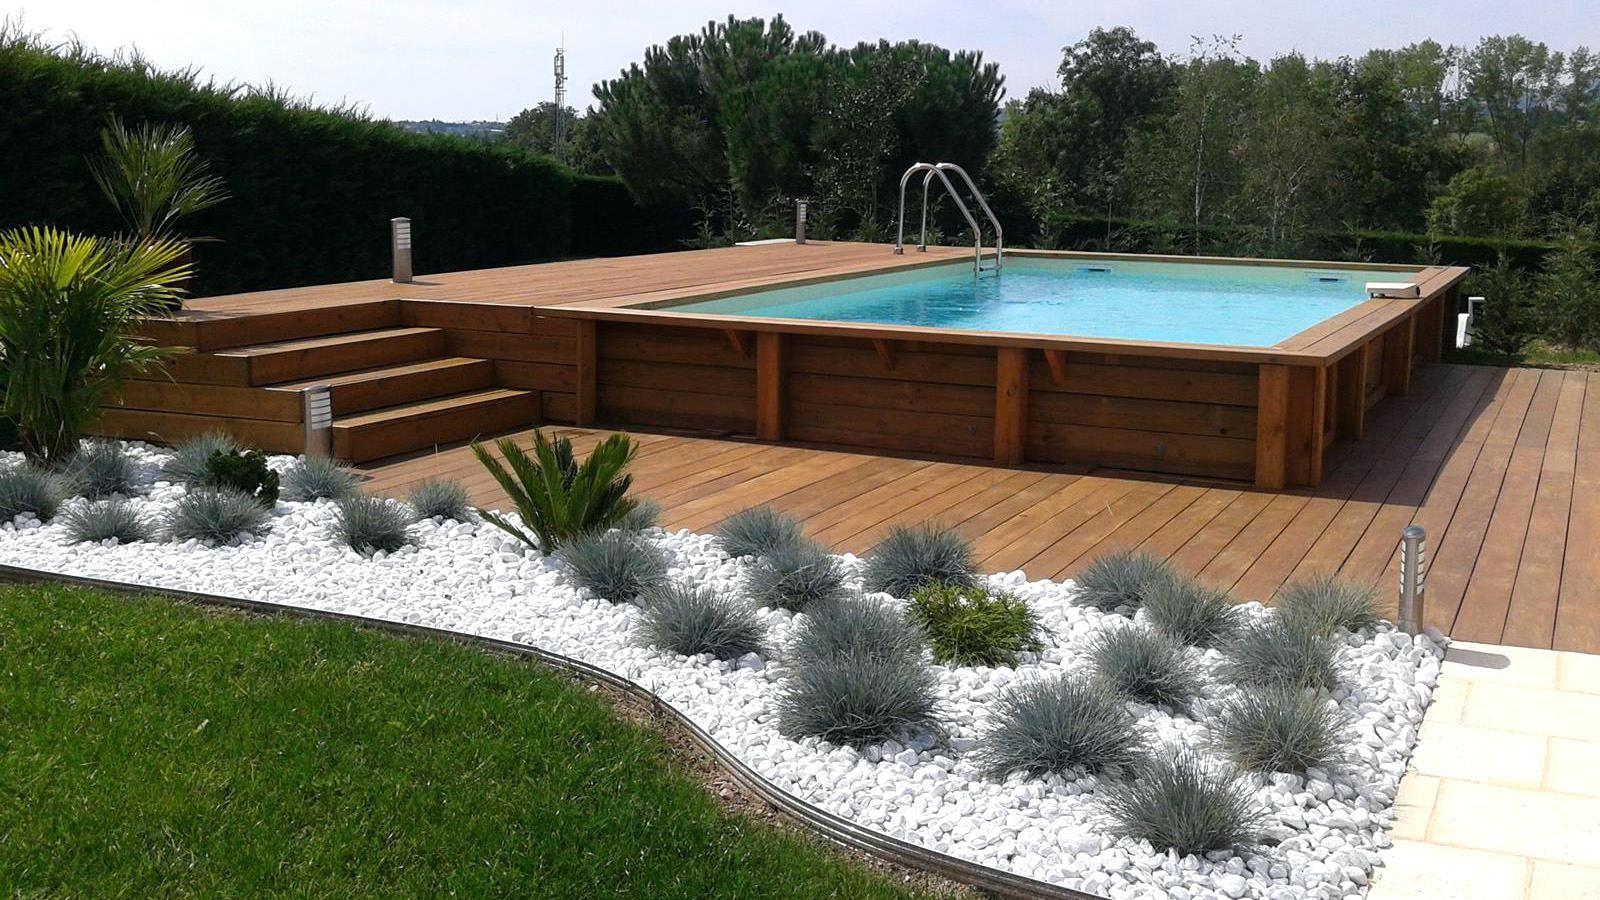 Terrasse Bois Piscine Hors Sol Et Enterrace Exemple Chantier ... avec Installer Une Piscine Hors Sol